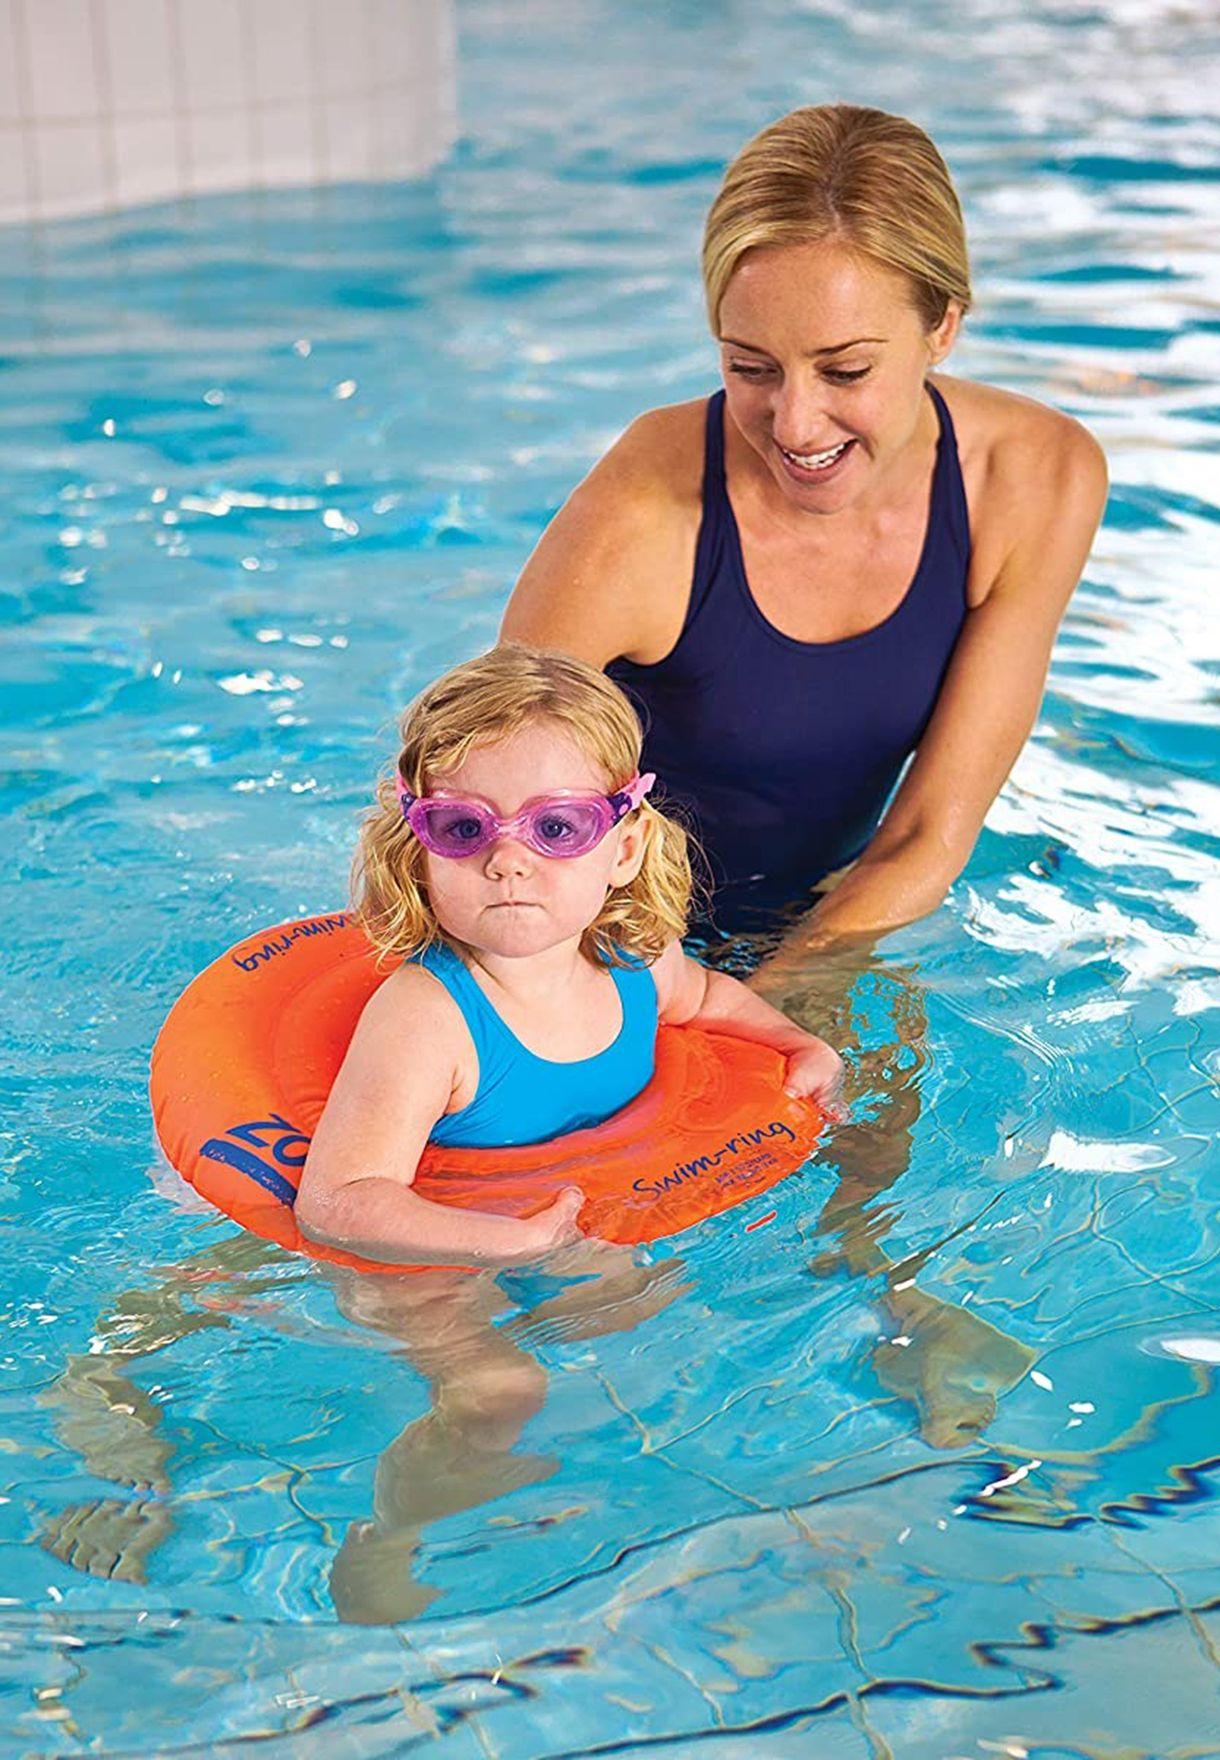 Kids Swimming Ring 2-3 Years